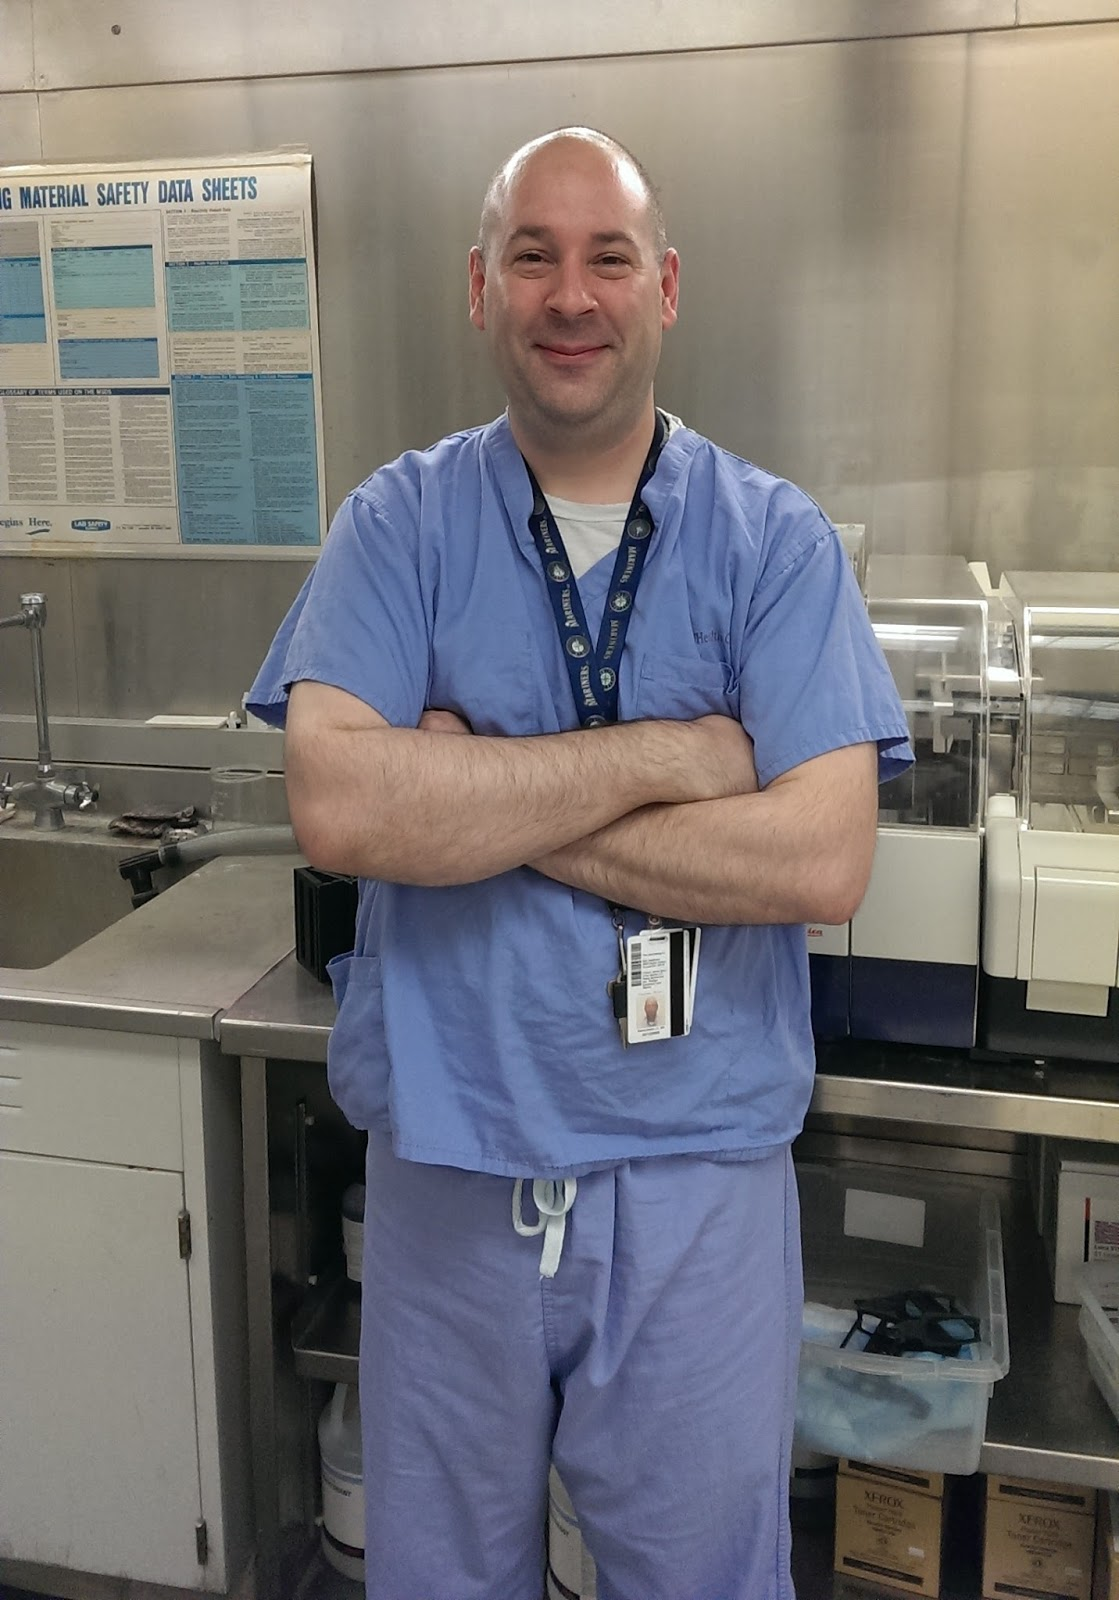 neuropathology blog: Featured Neuropathologist: PJ Cimino